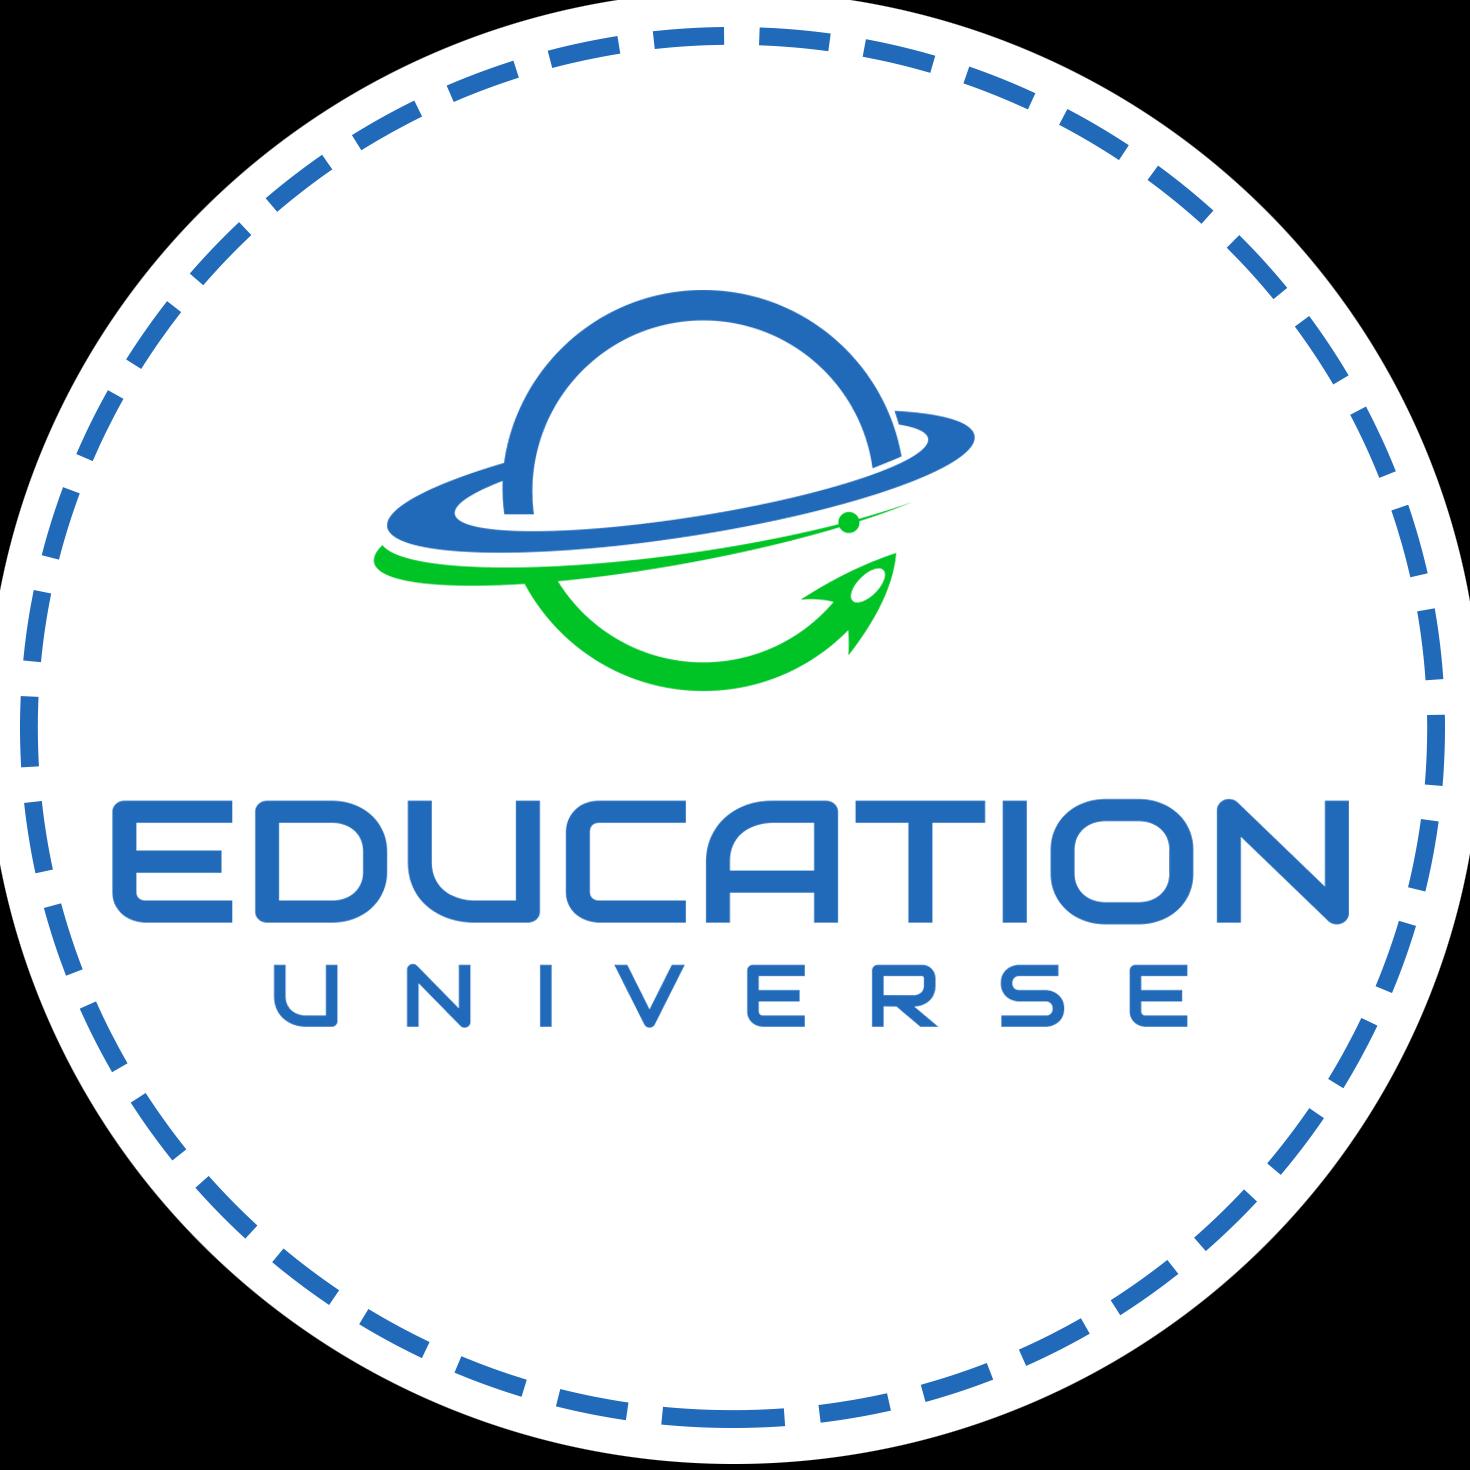 Education Universe